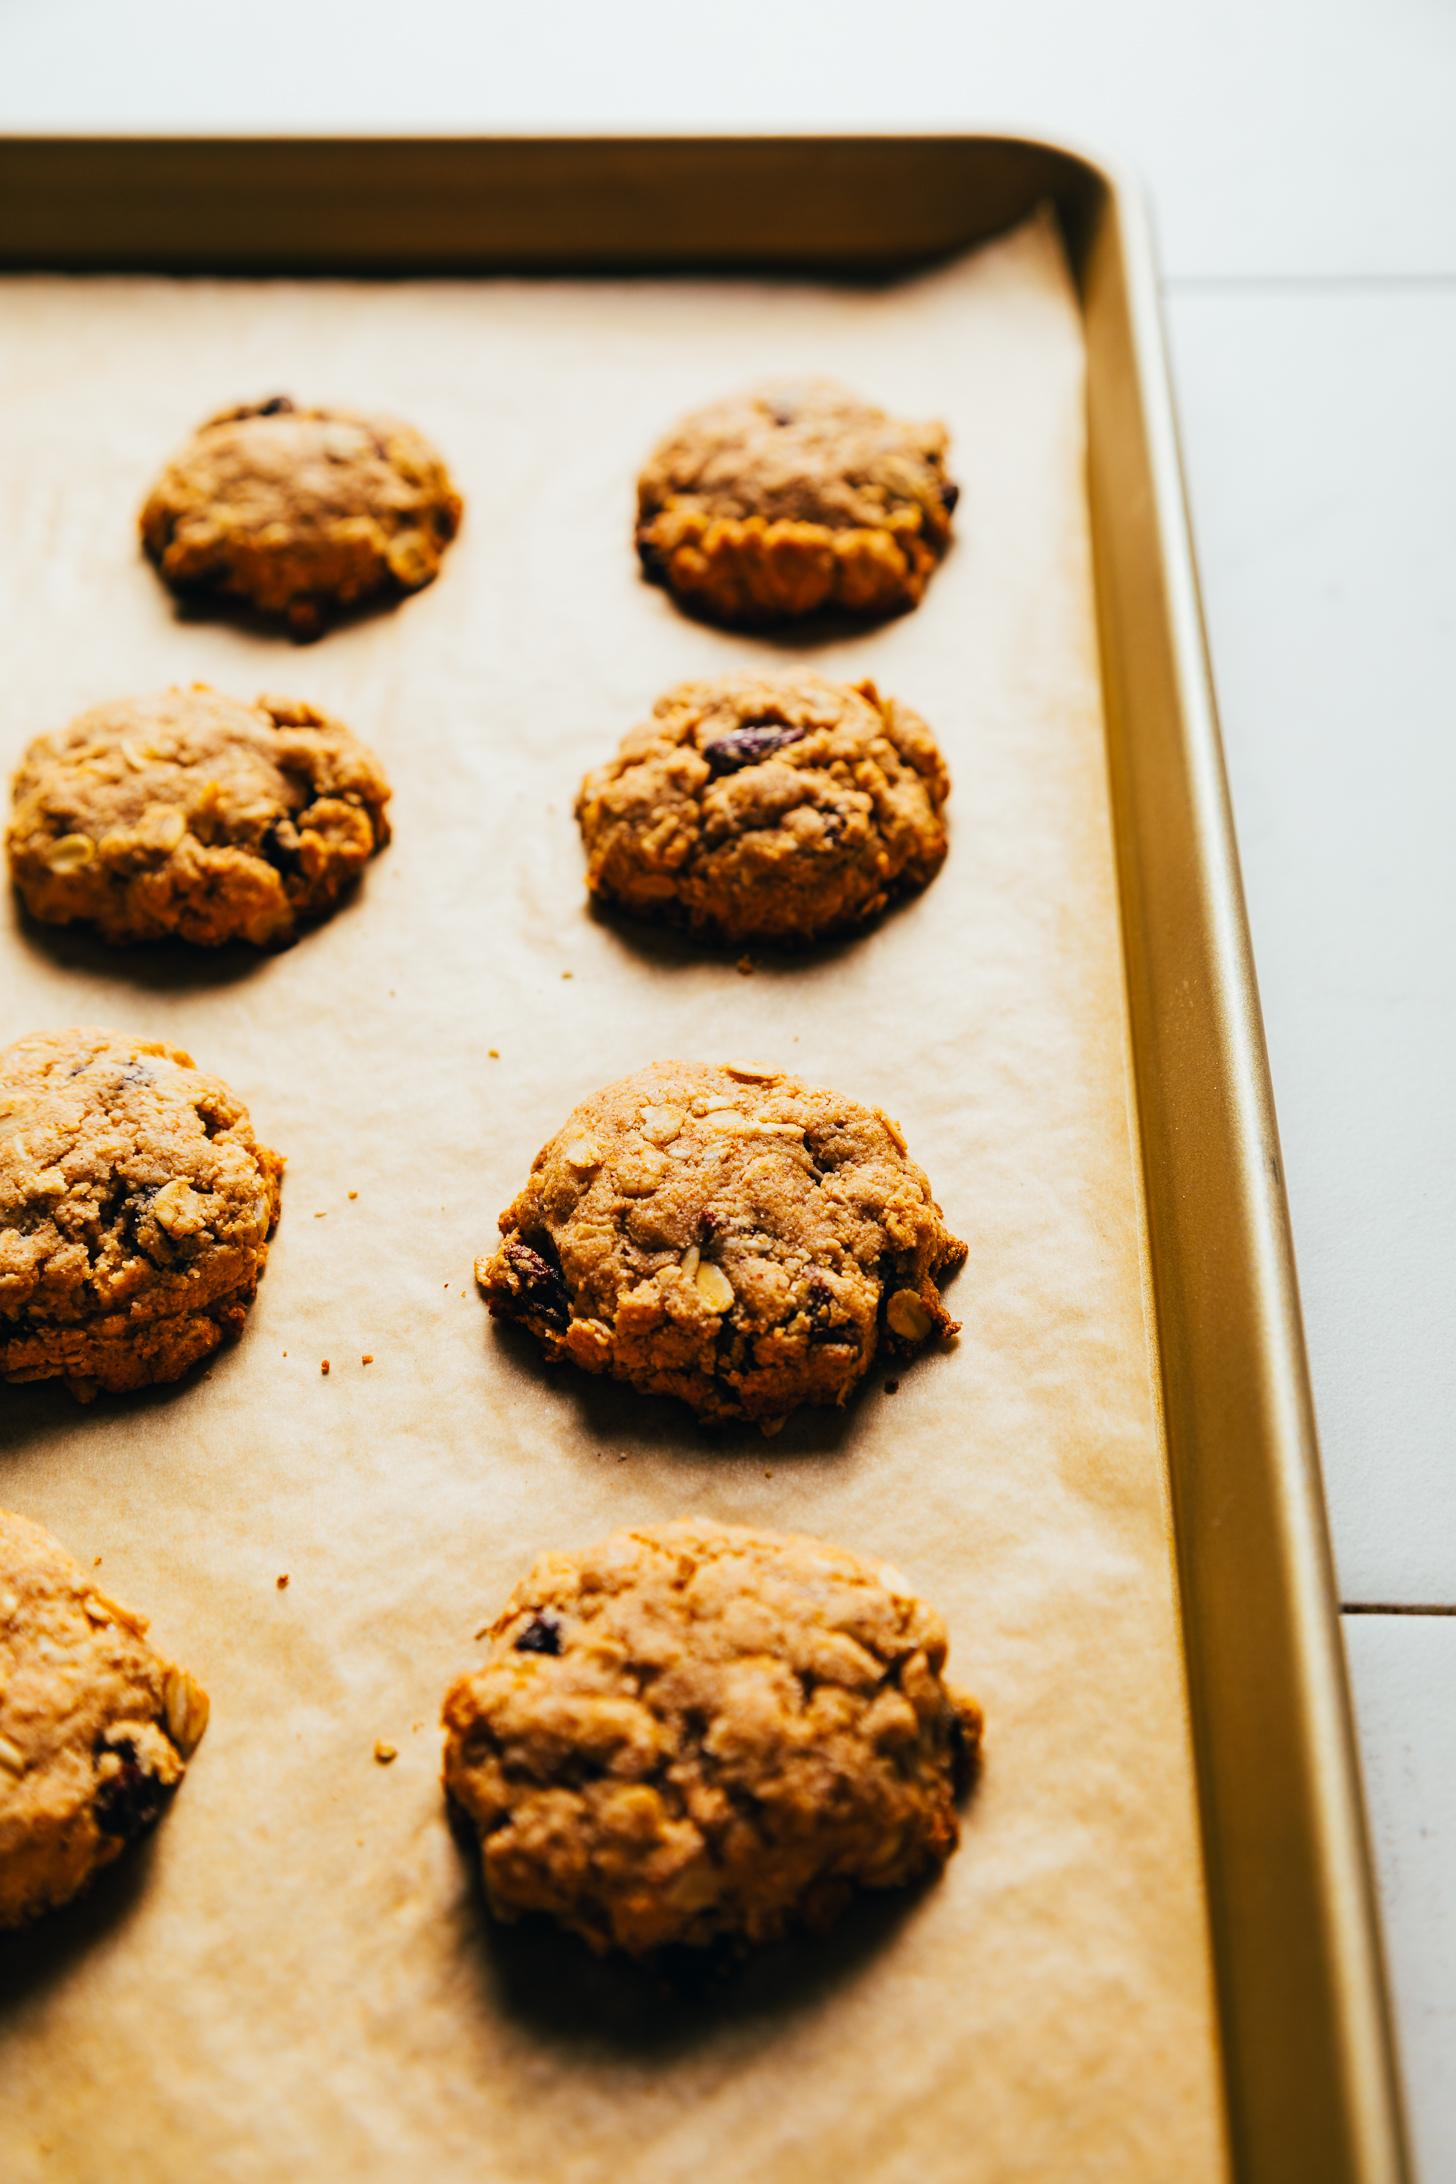 Parchment-lined baking sheet of vegan oatmeal raisin cookies